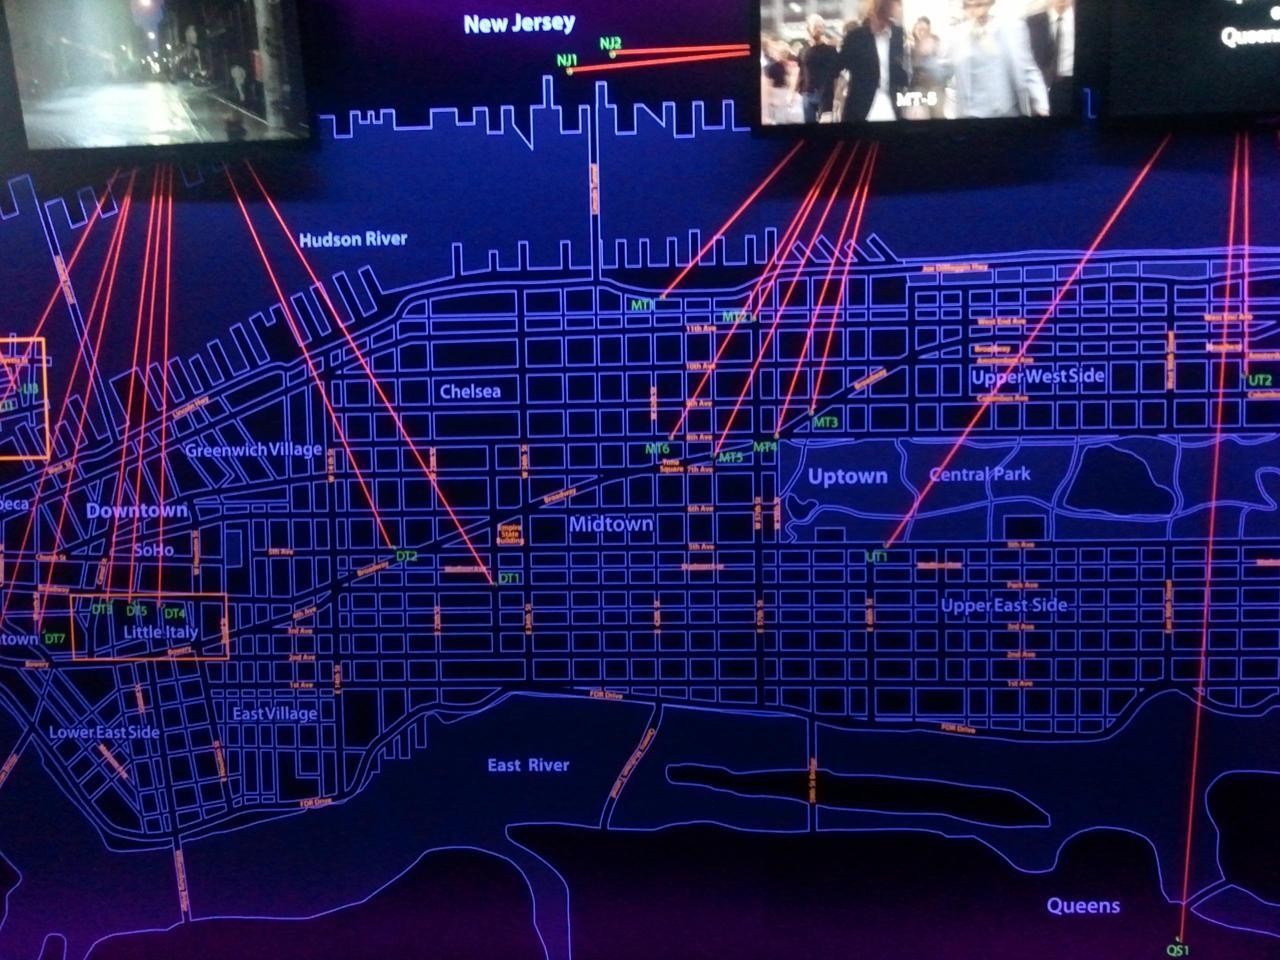 NYC according to Martin Scorsese